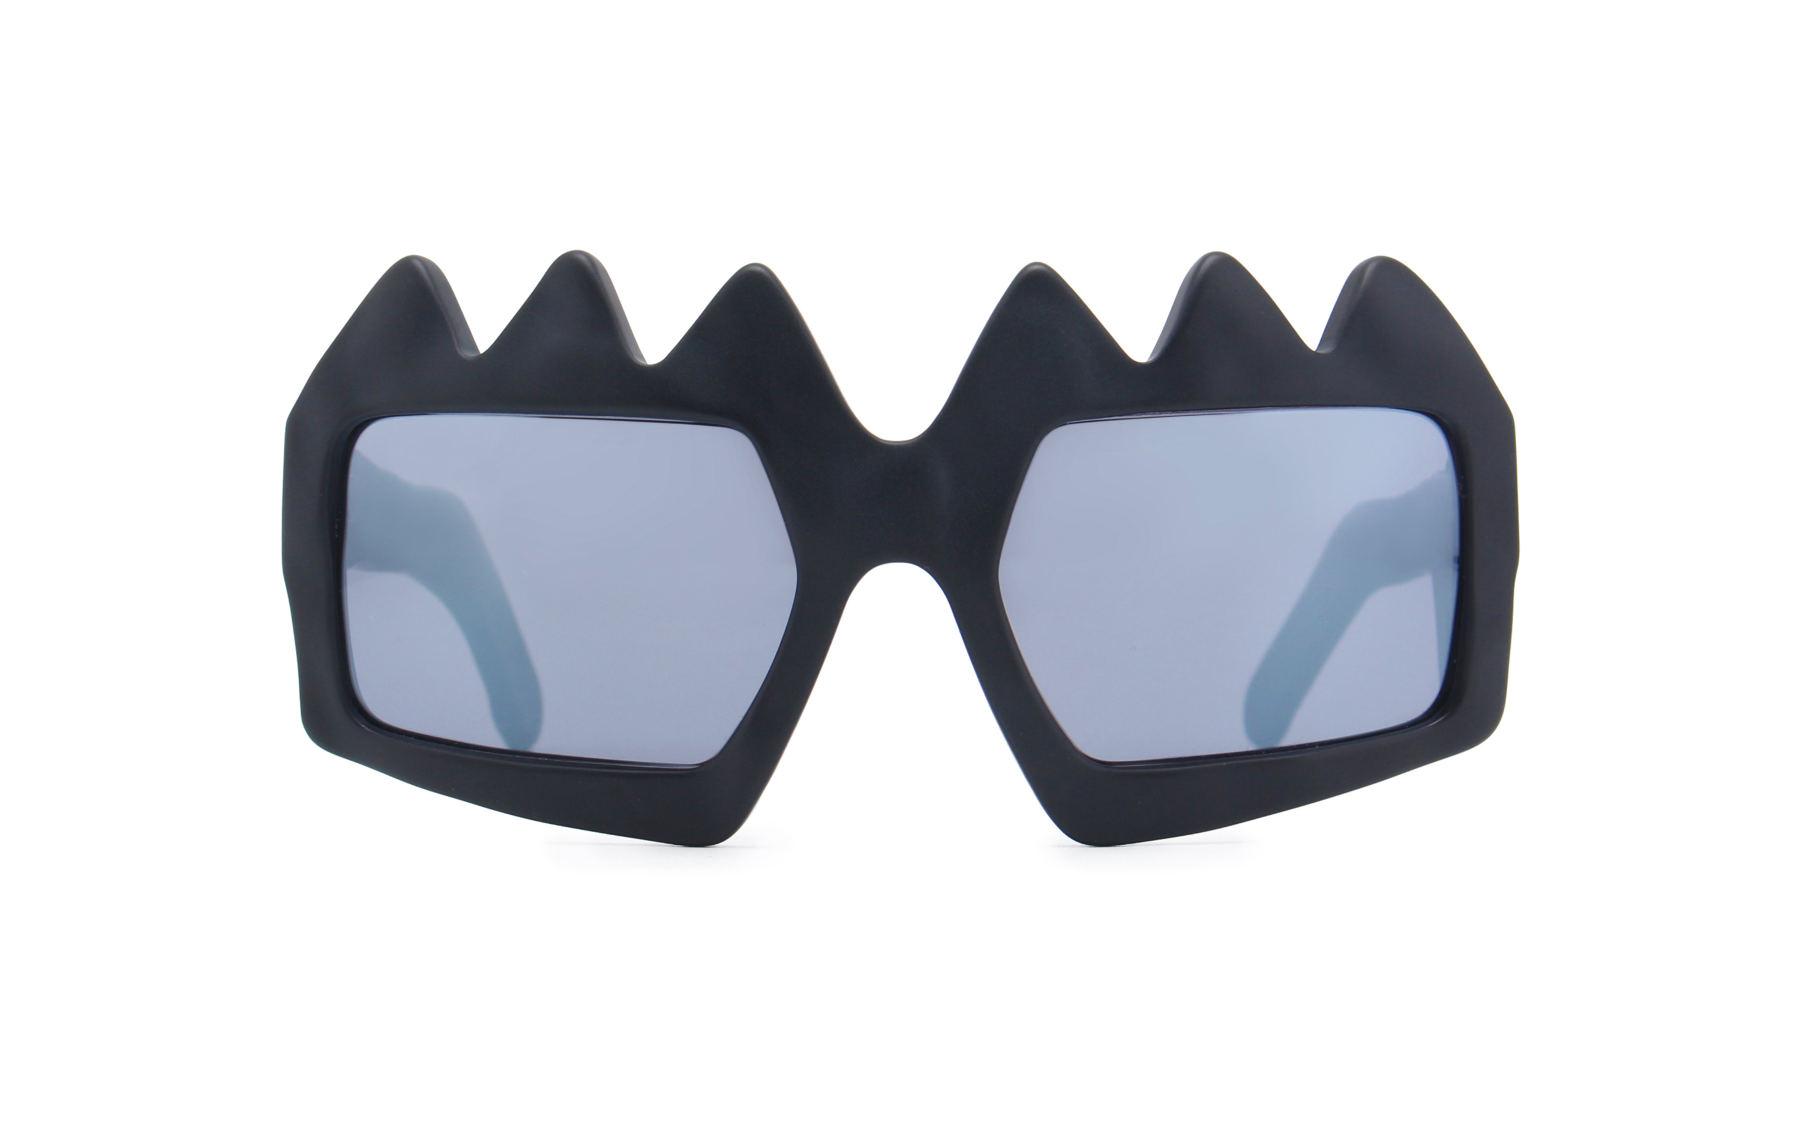 FAKBYFAK x Walter Van Beirendonck  Bliksem Sunglasses. Black Code: 09/13/01